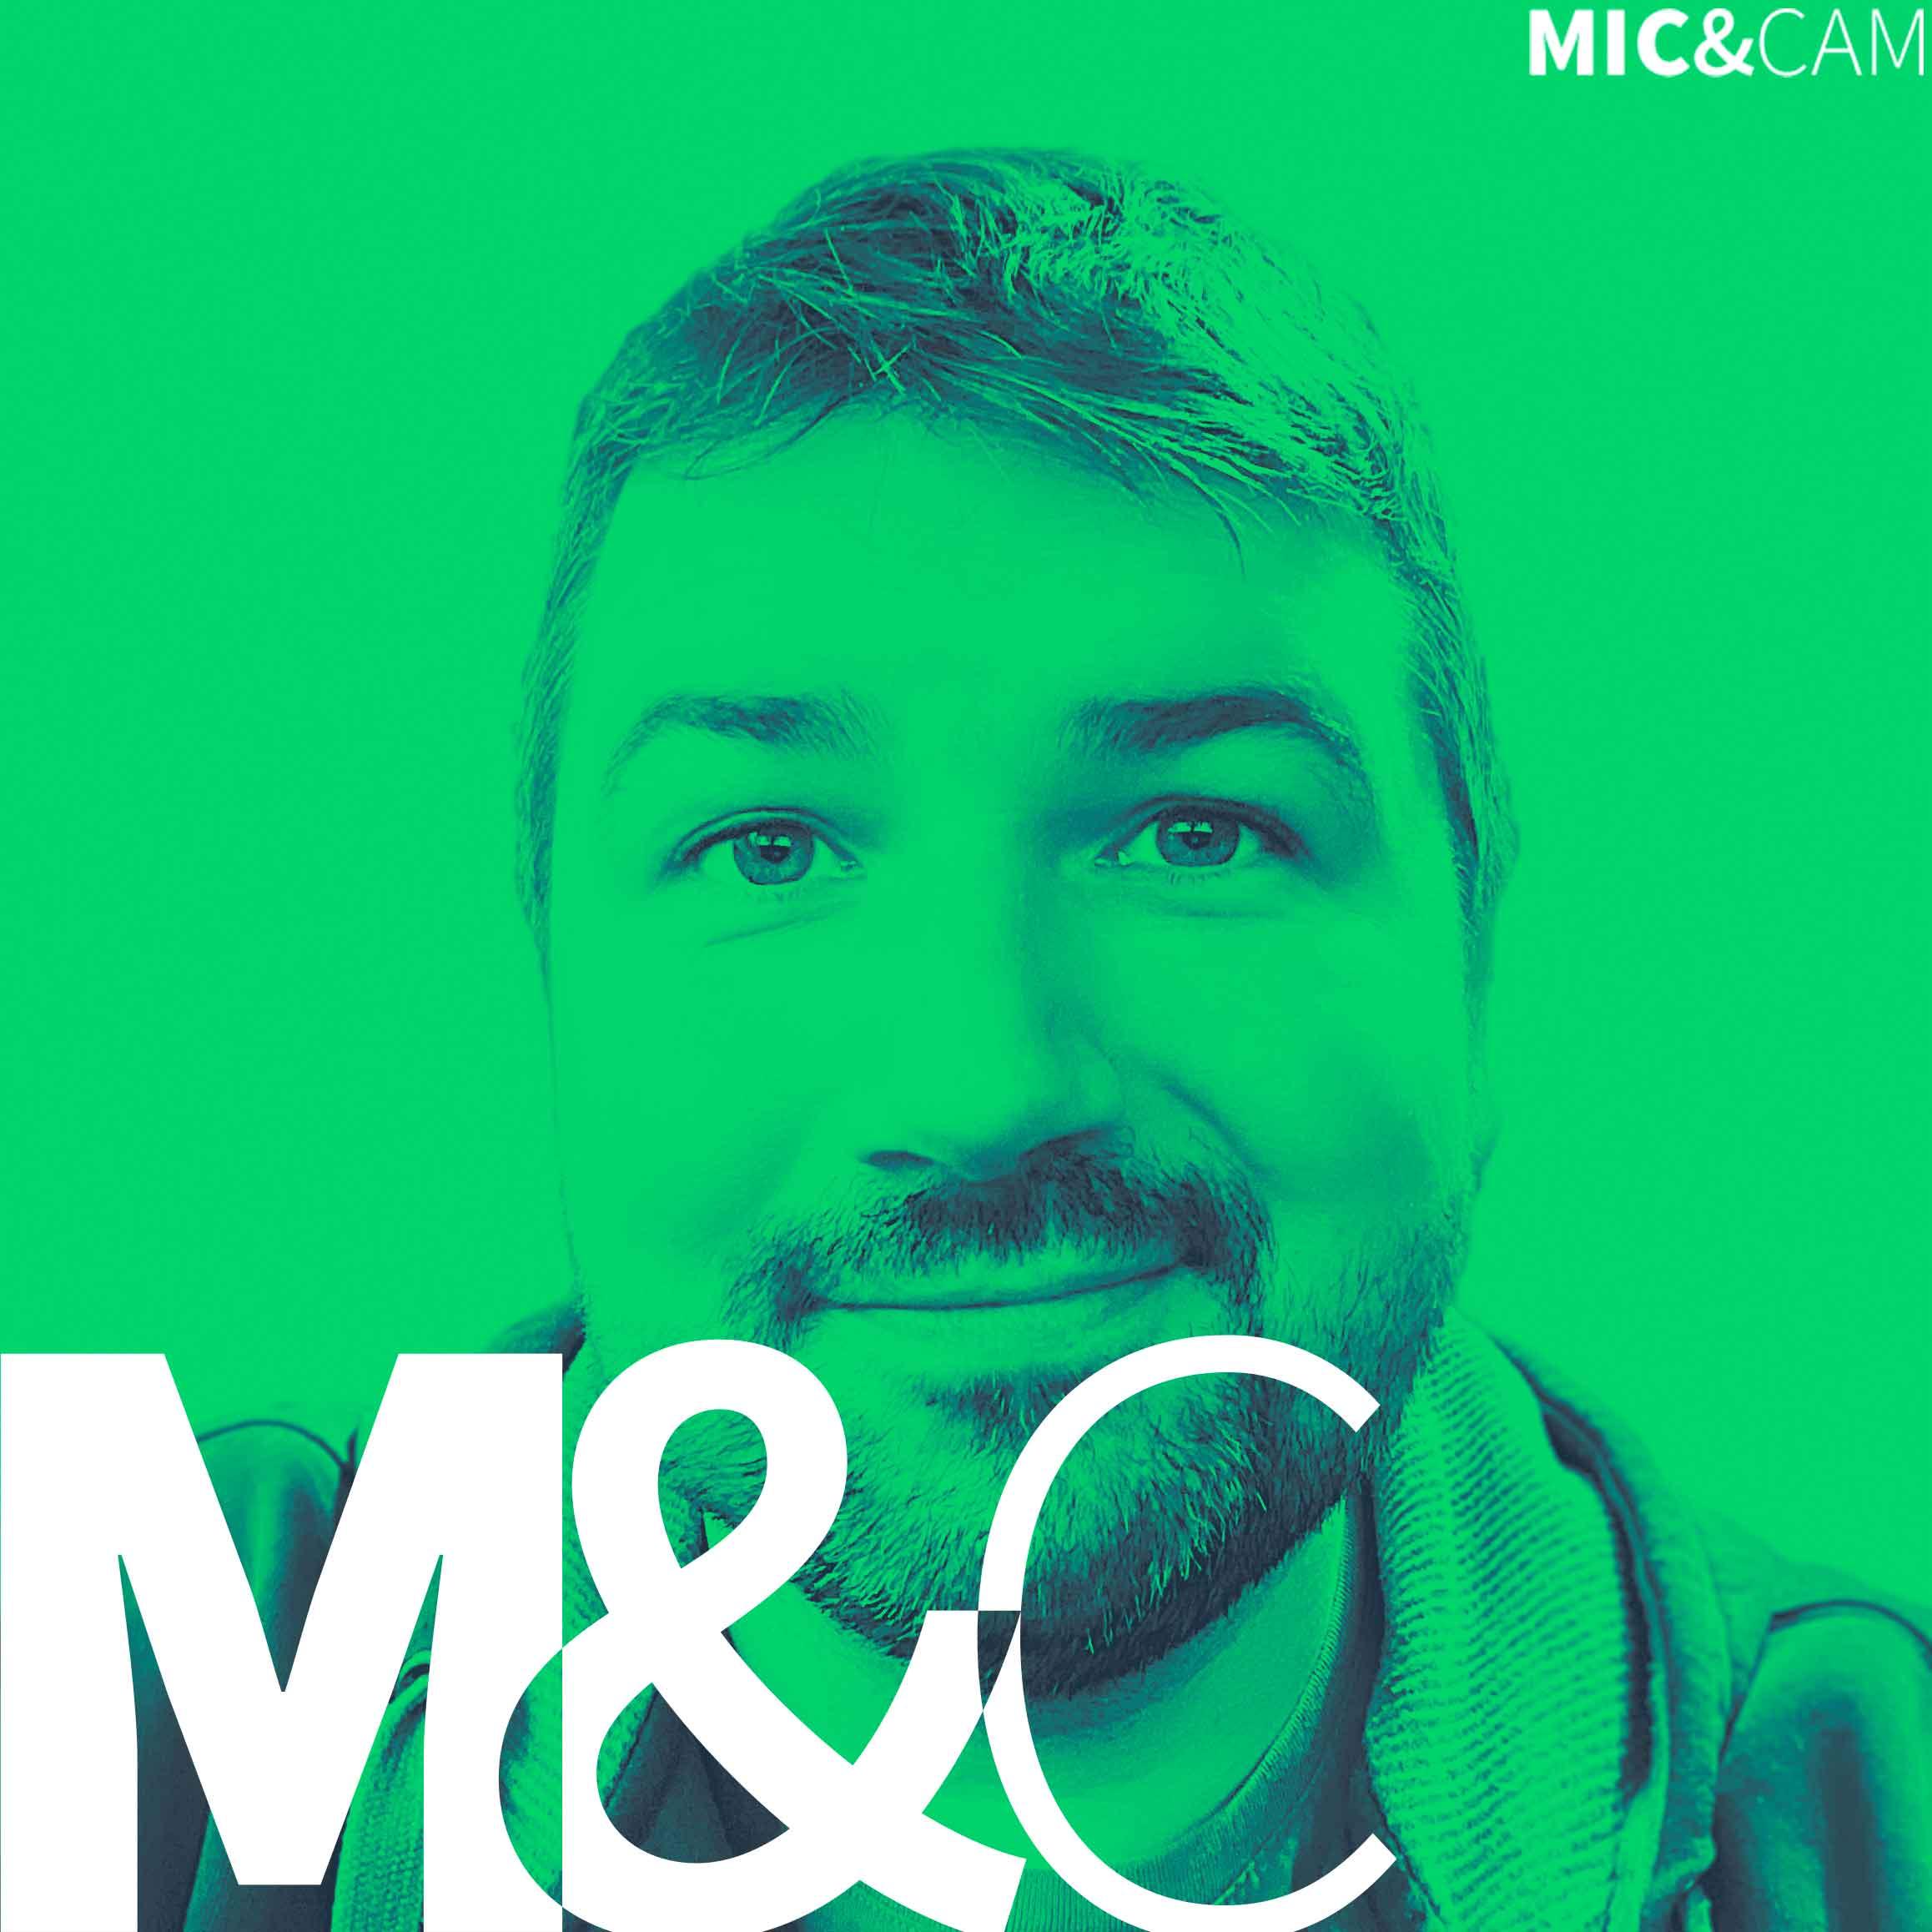 MIC & CAM